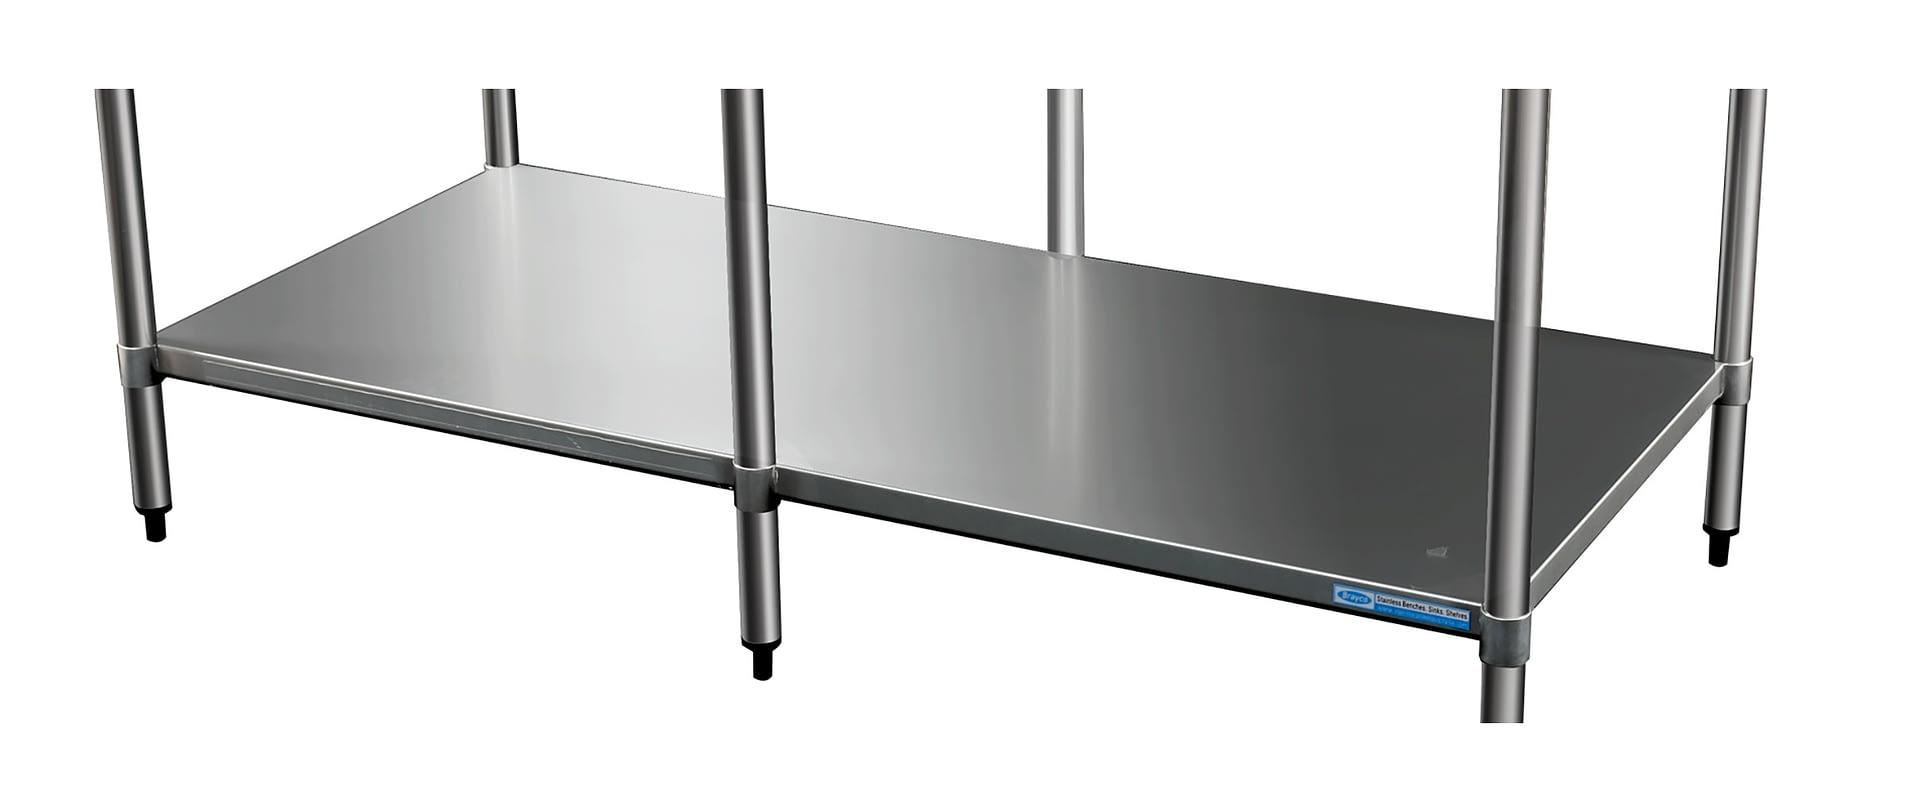 Stainless Undershelf for 2484 Bench